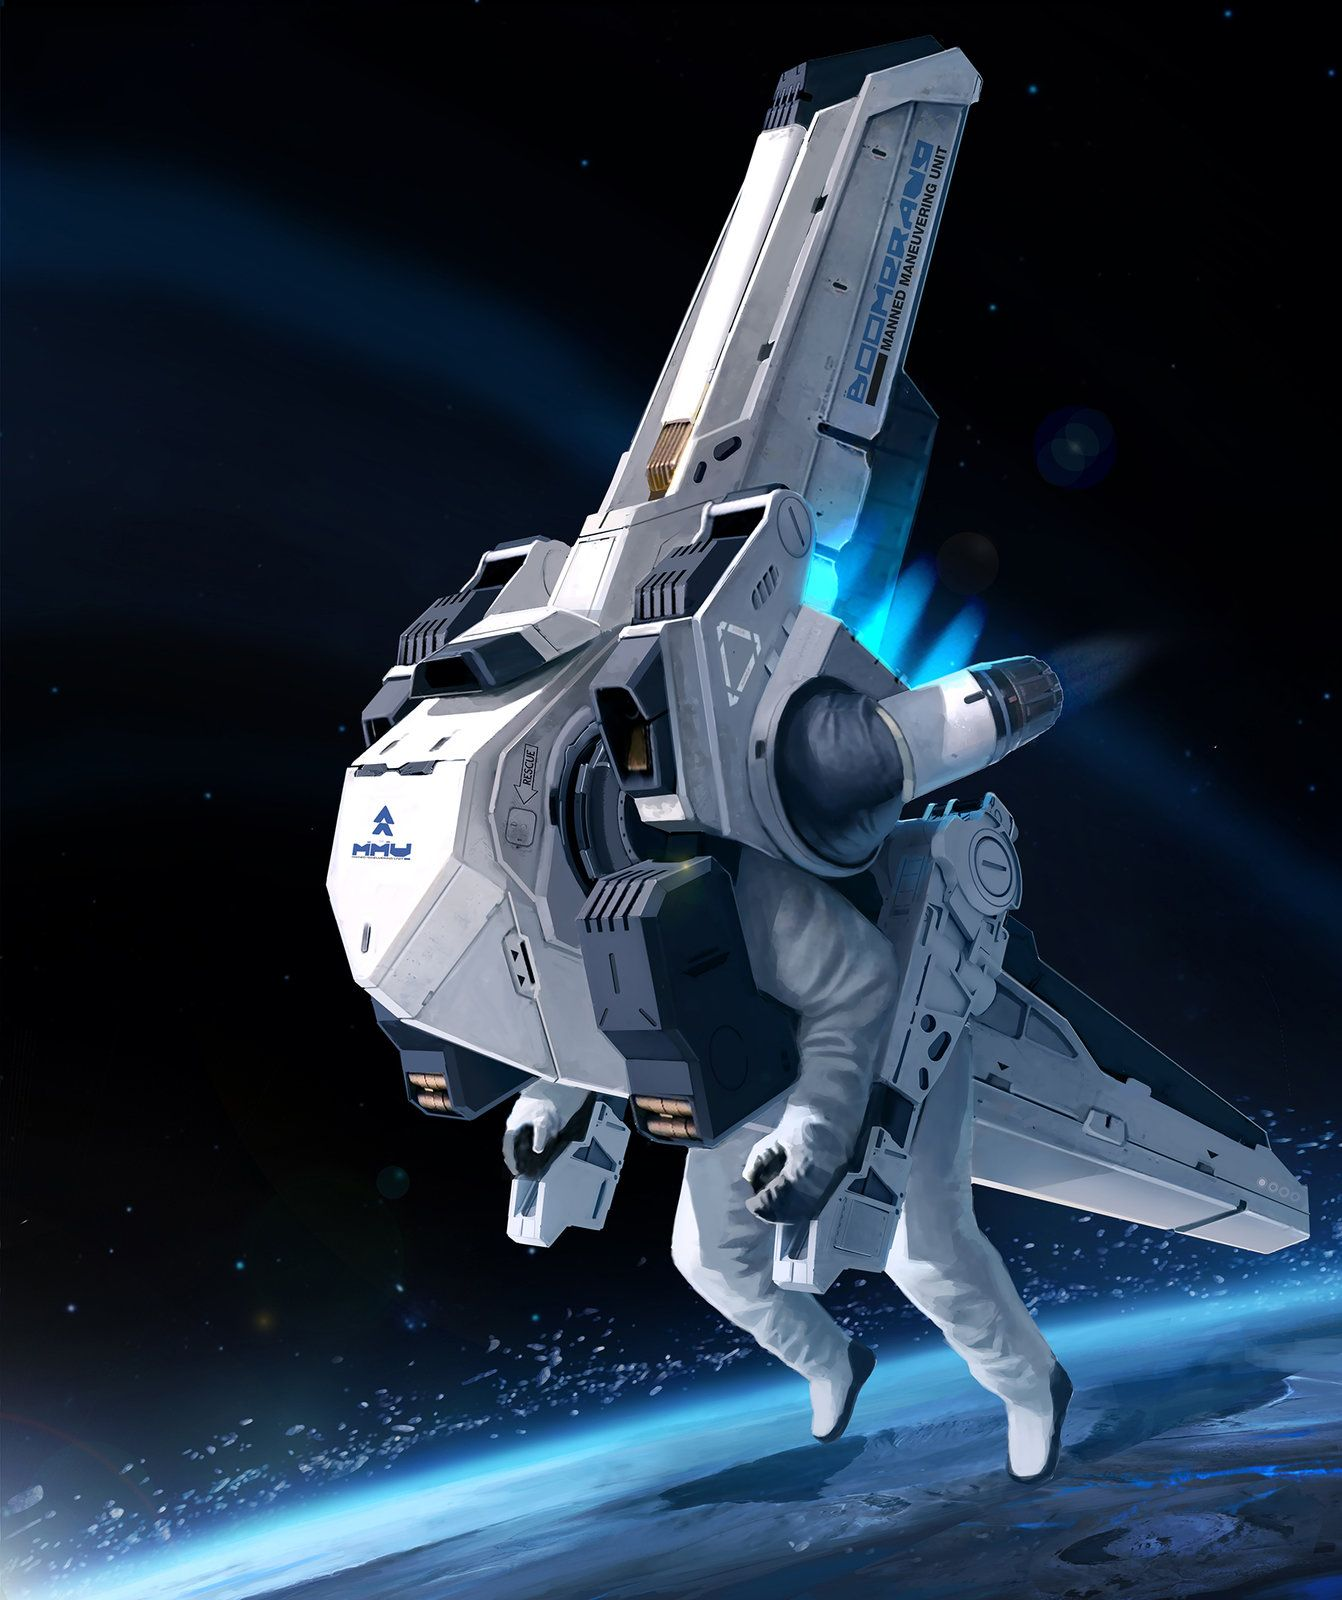 future rocket ship - 736×877